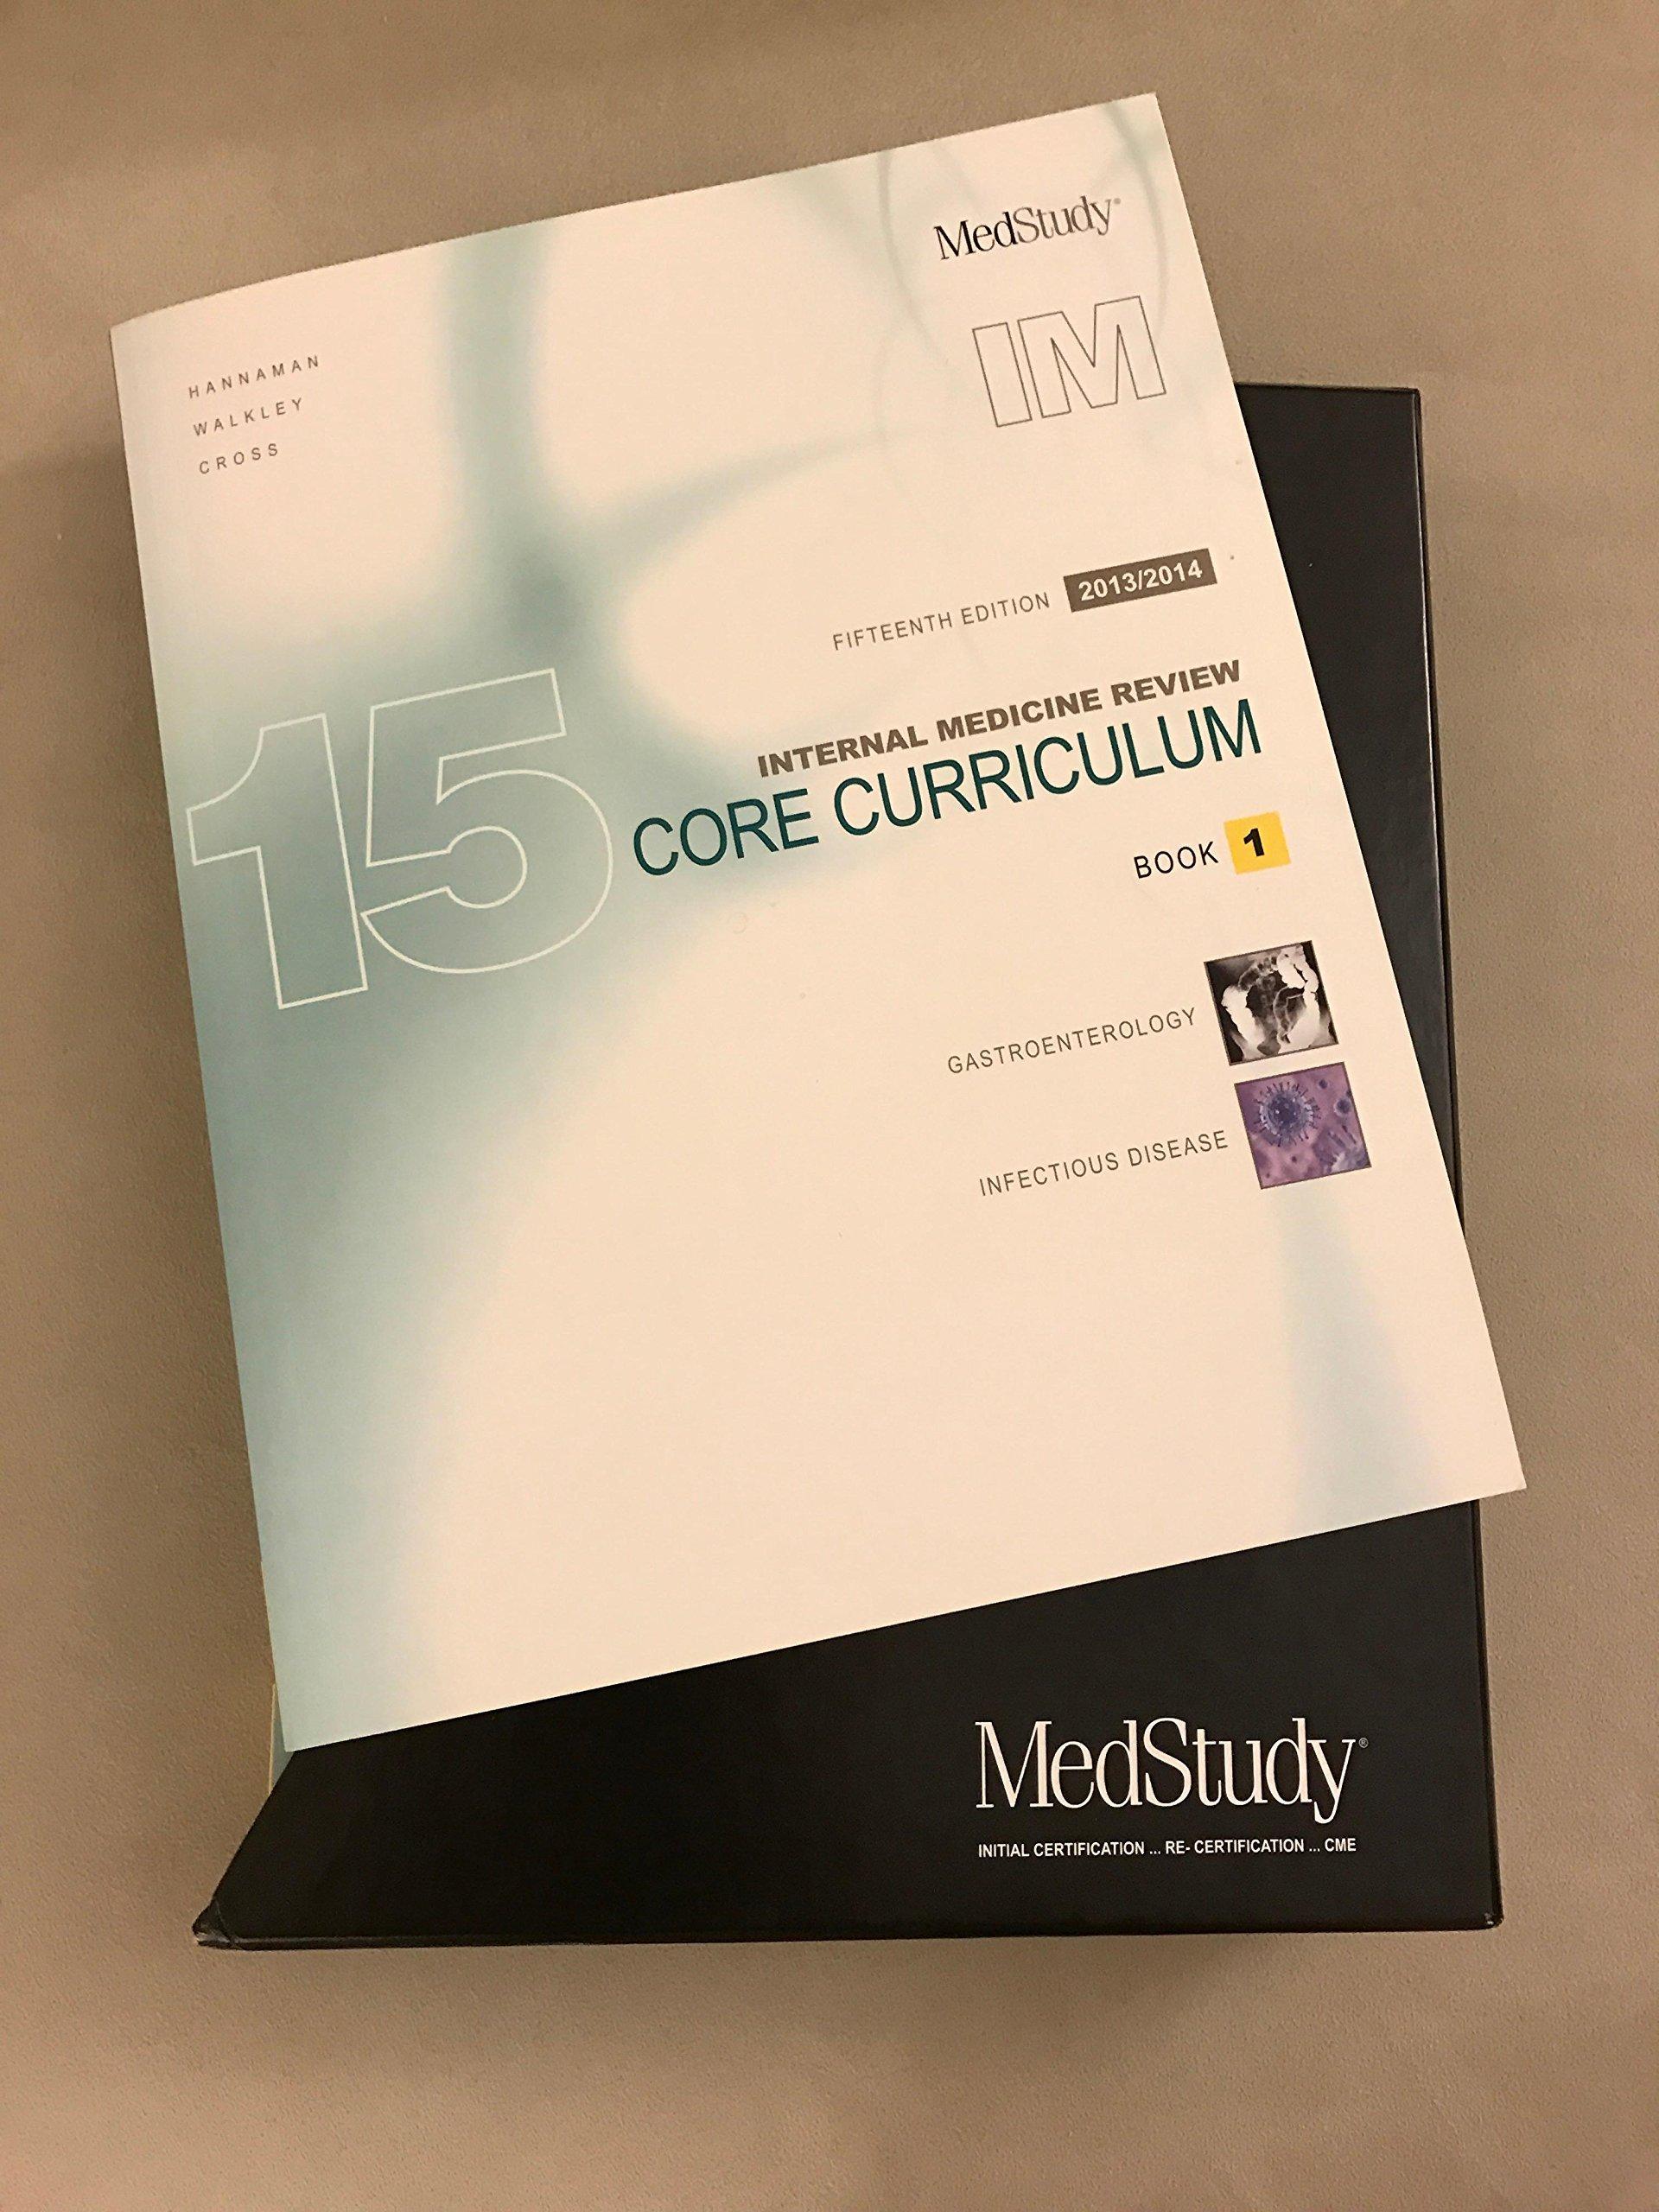 Medstudy Internal Medicine Core Curriculum, 15th Edition pdf